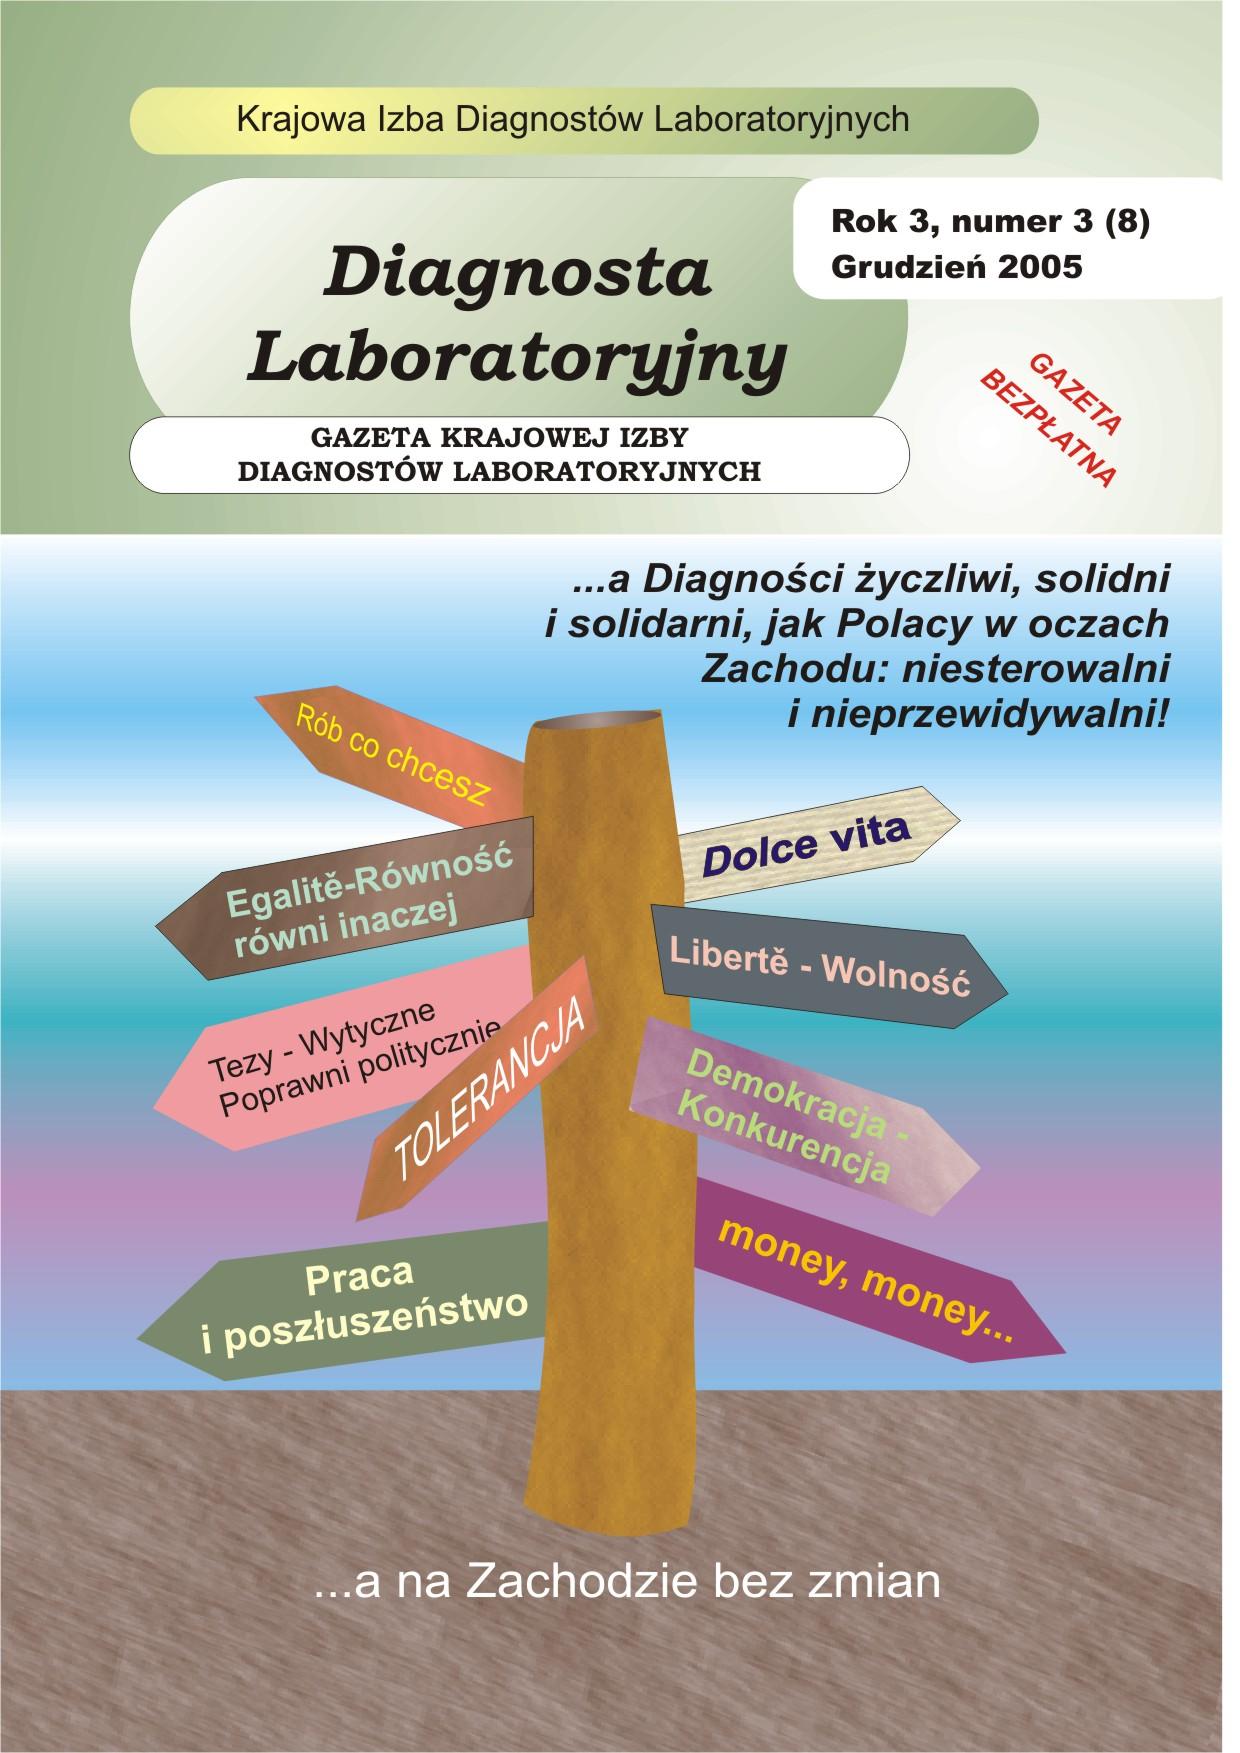 Diagnosta Laboratoryjny - Rok 3, Numer 3 (8) - grudzień 2005 r.